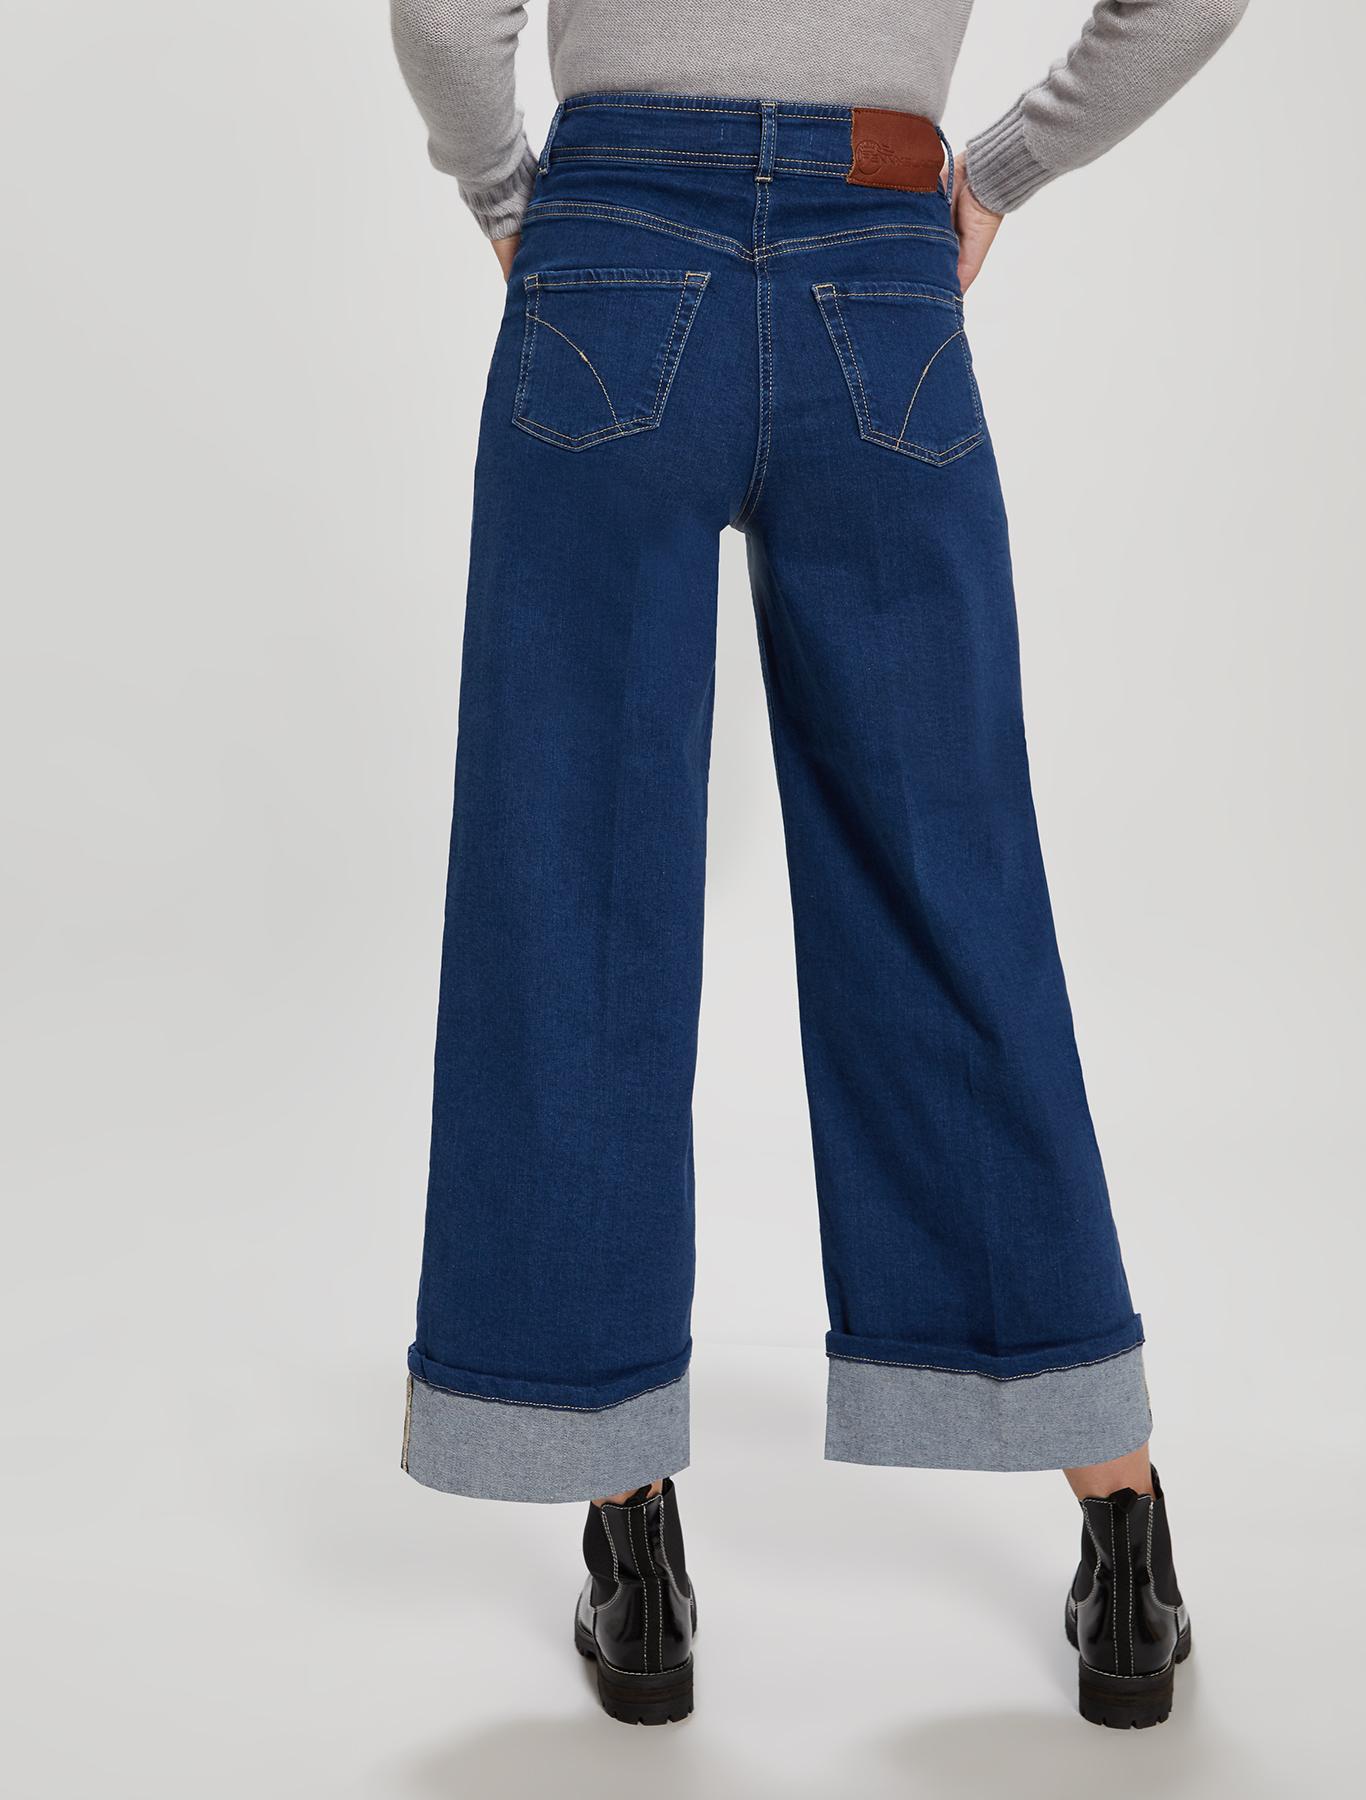 Denim culottes with turn-ups - midnight blue - pennyblack